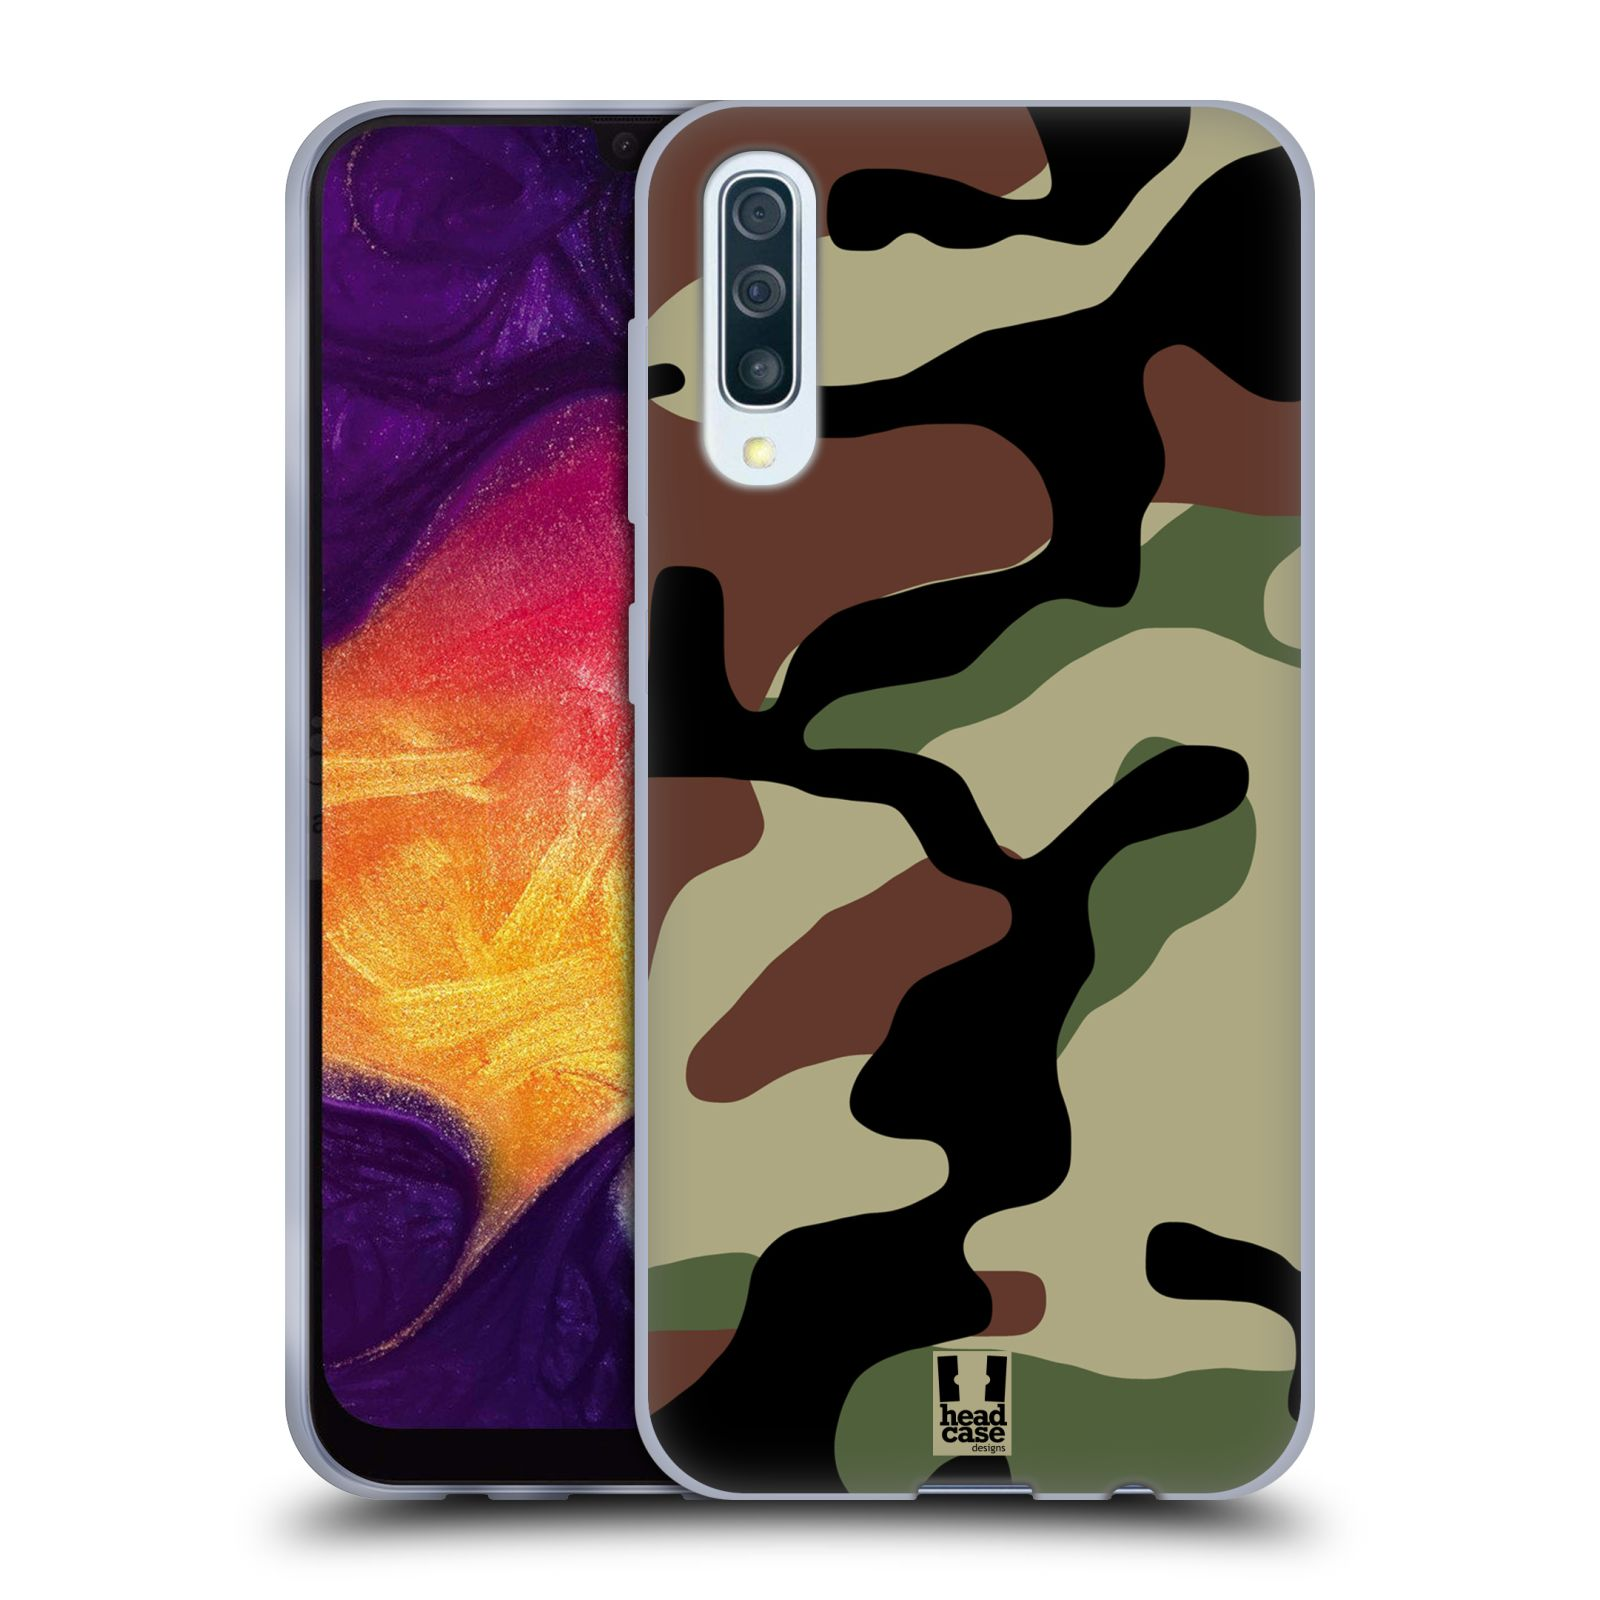 Silikonové pouzdro na mobil Samsung Galaxy A50 / A30s - Head Case - Maskáče